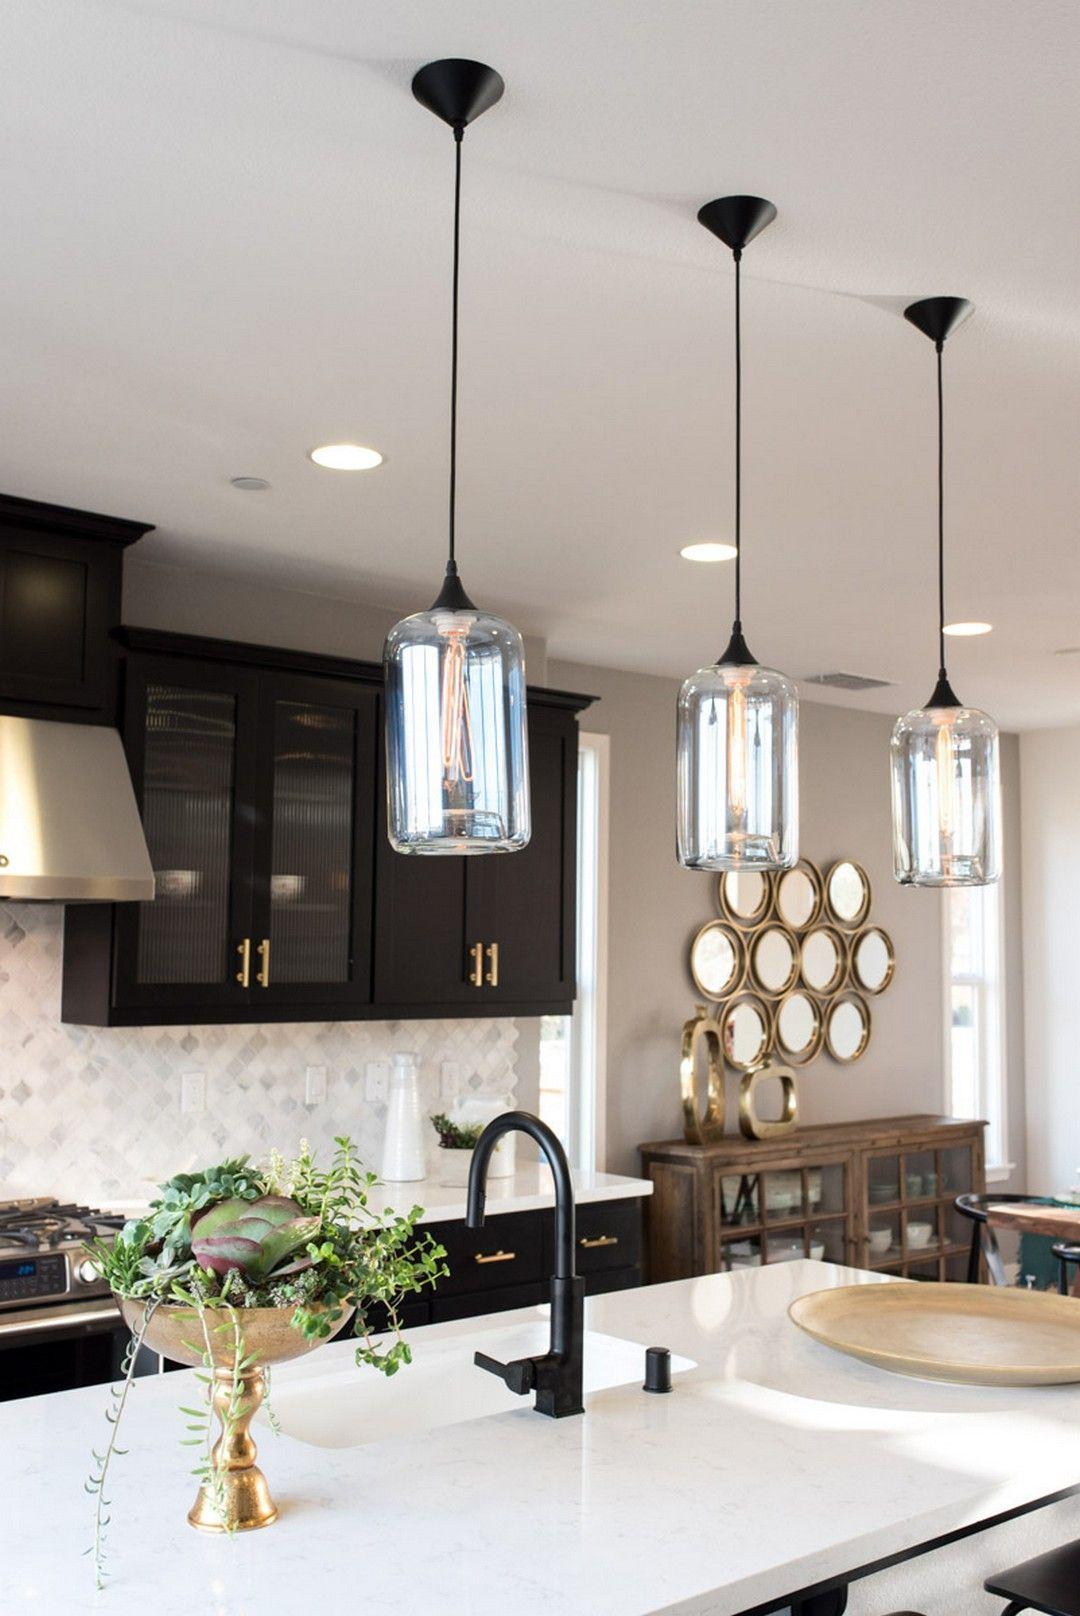 100 beautiful kitchen lighting ideas that you'll love